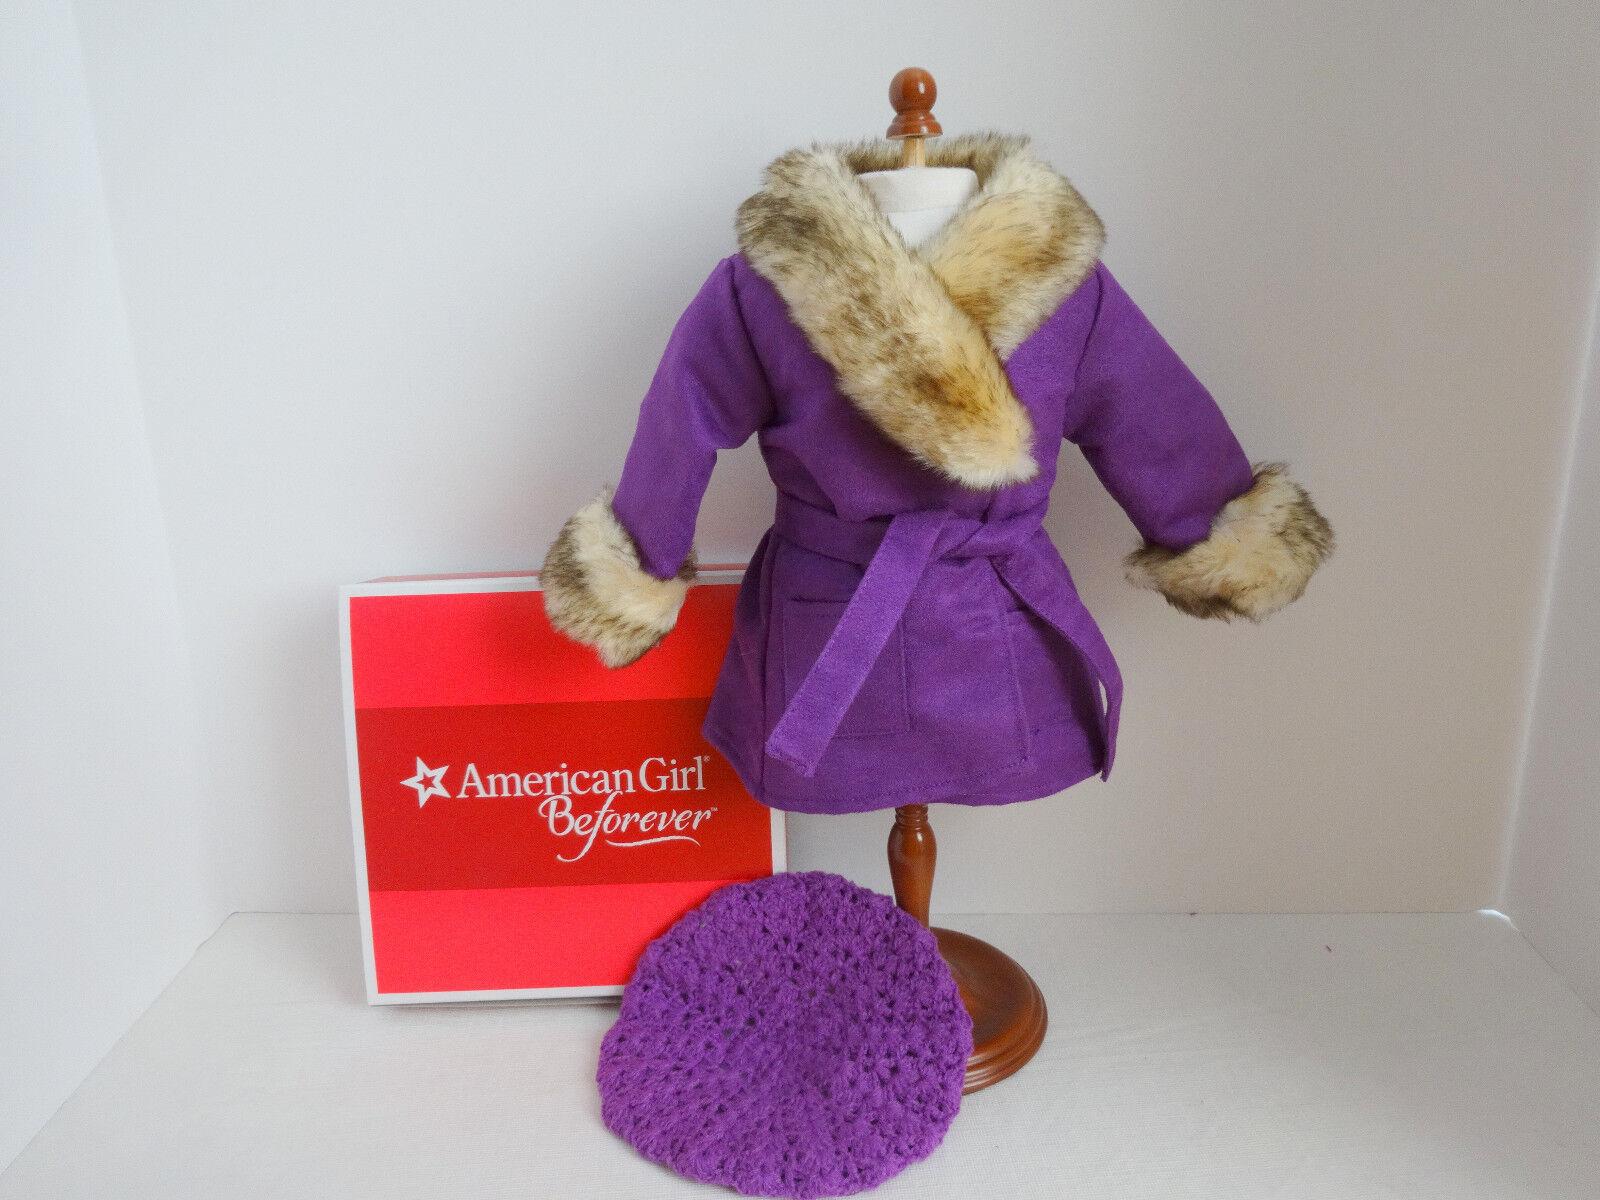 Beforever Julie/'s Winter Coat /& Hat for 18-inch Dolls NEW IN BOX American Girl